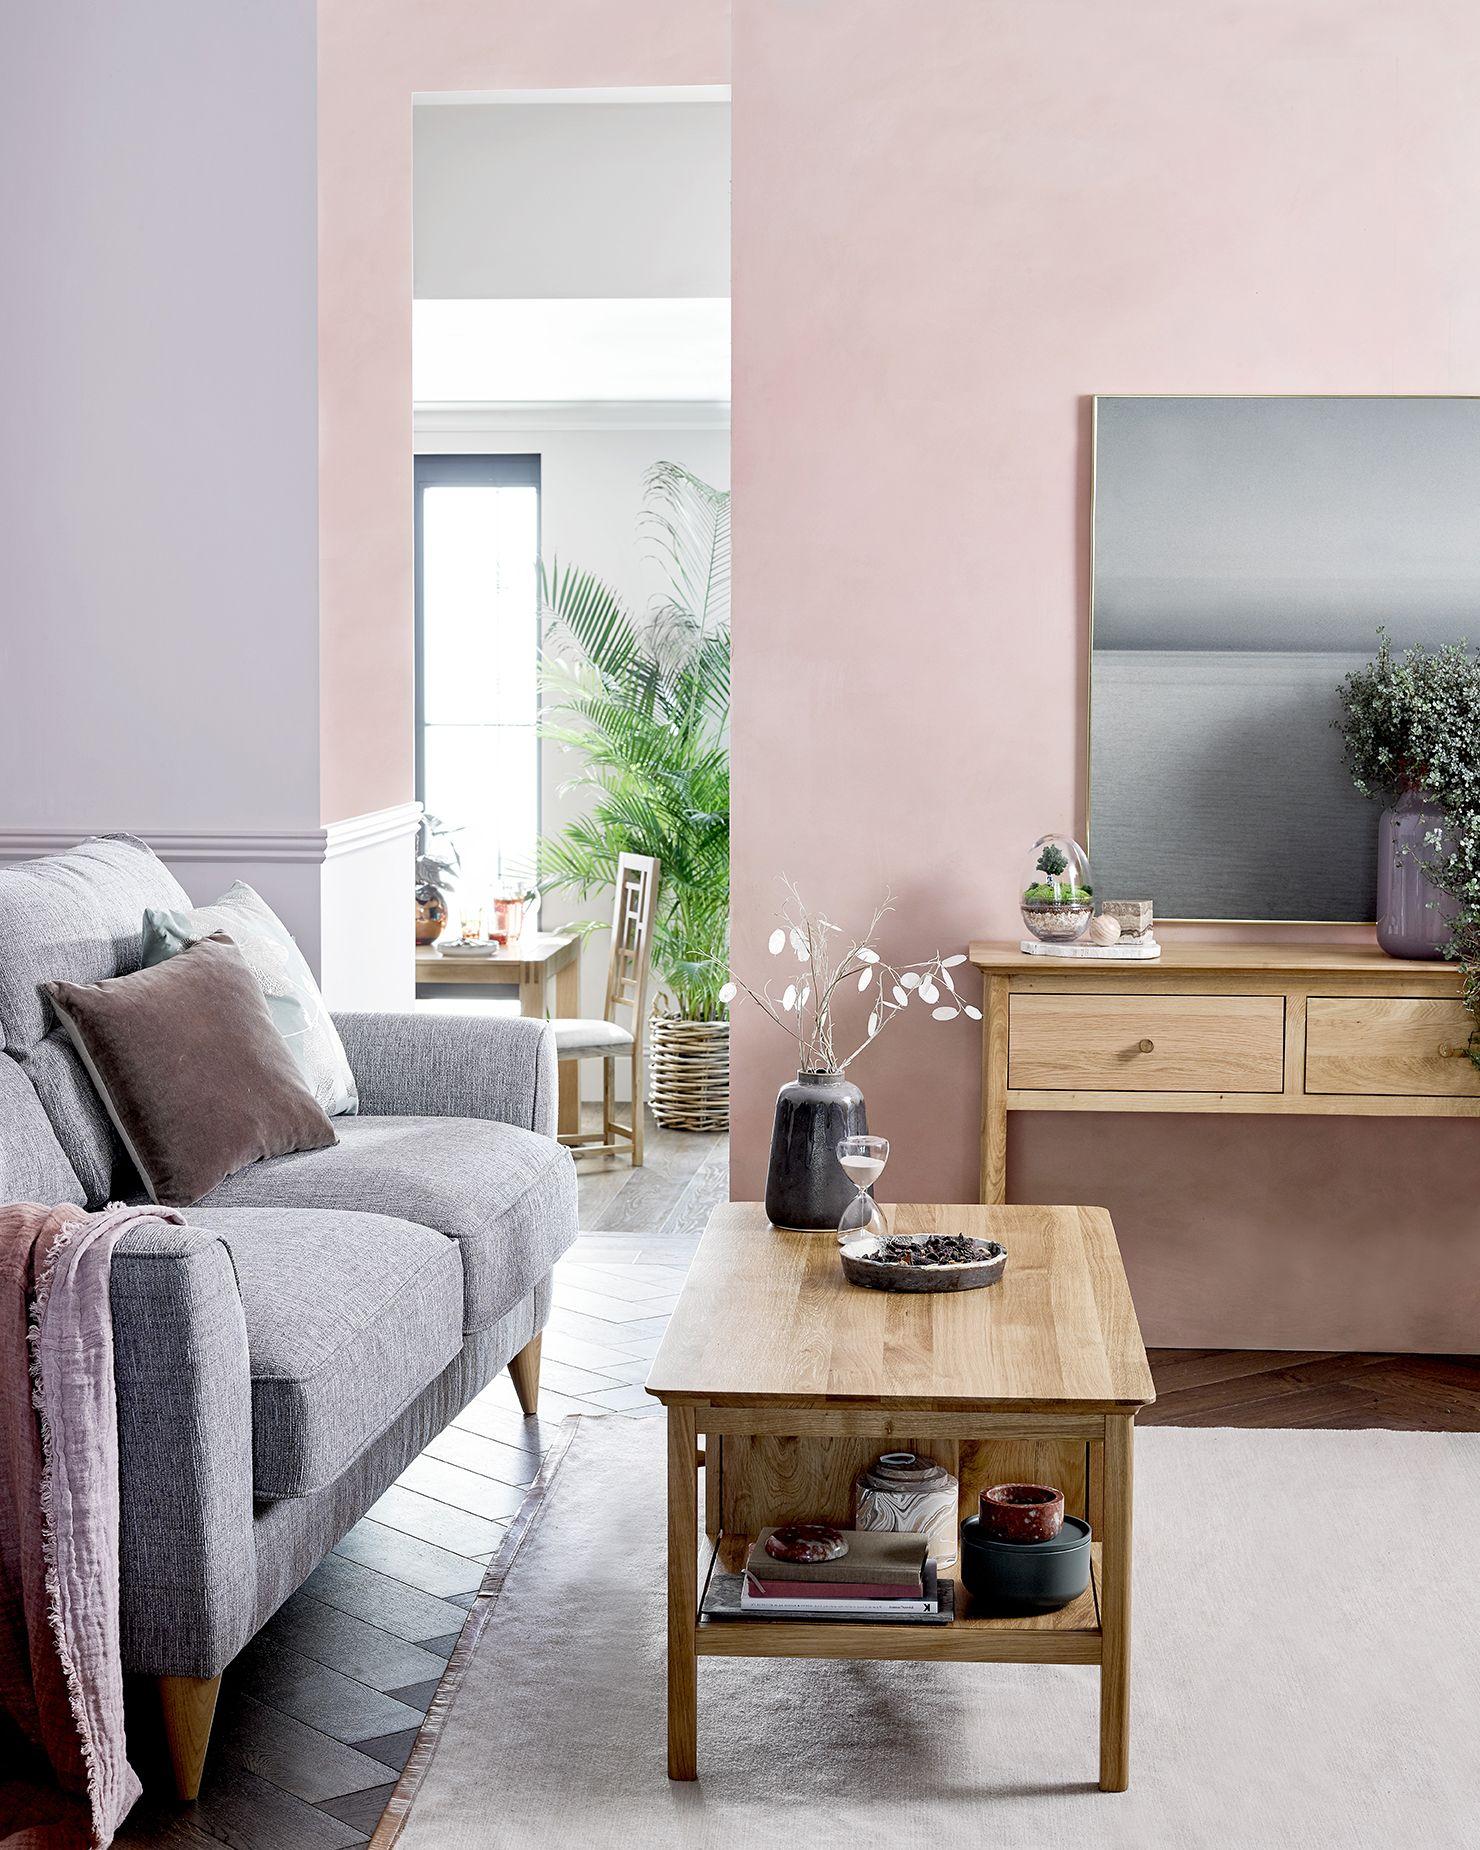 18 Small Living Room Ideas Small Living Room Decorating Ideas